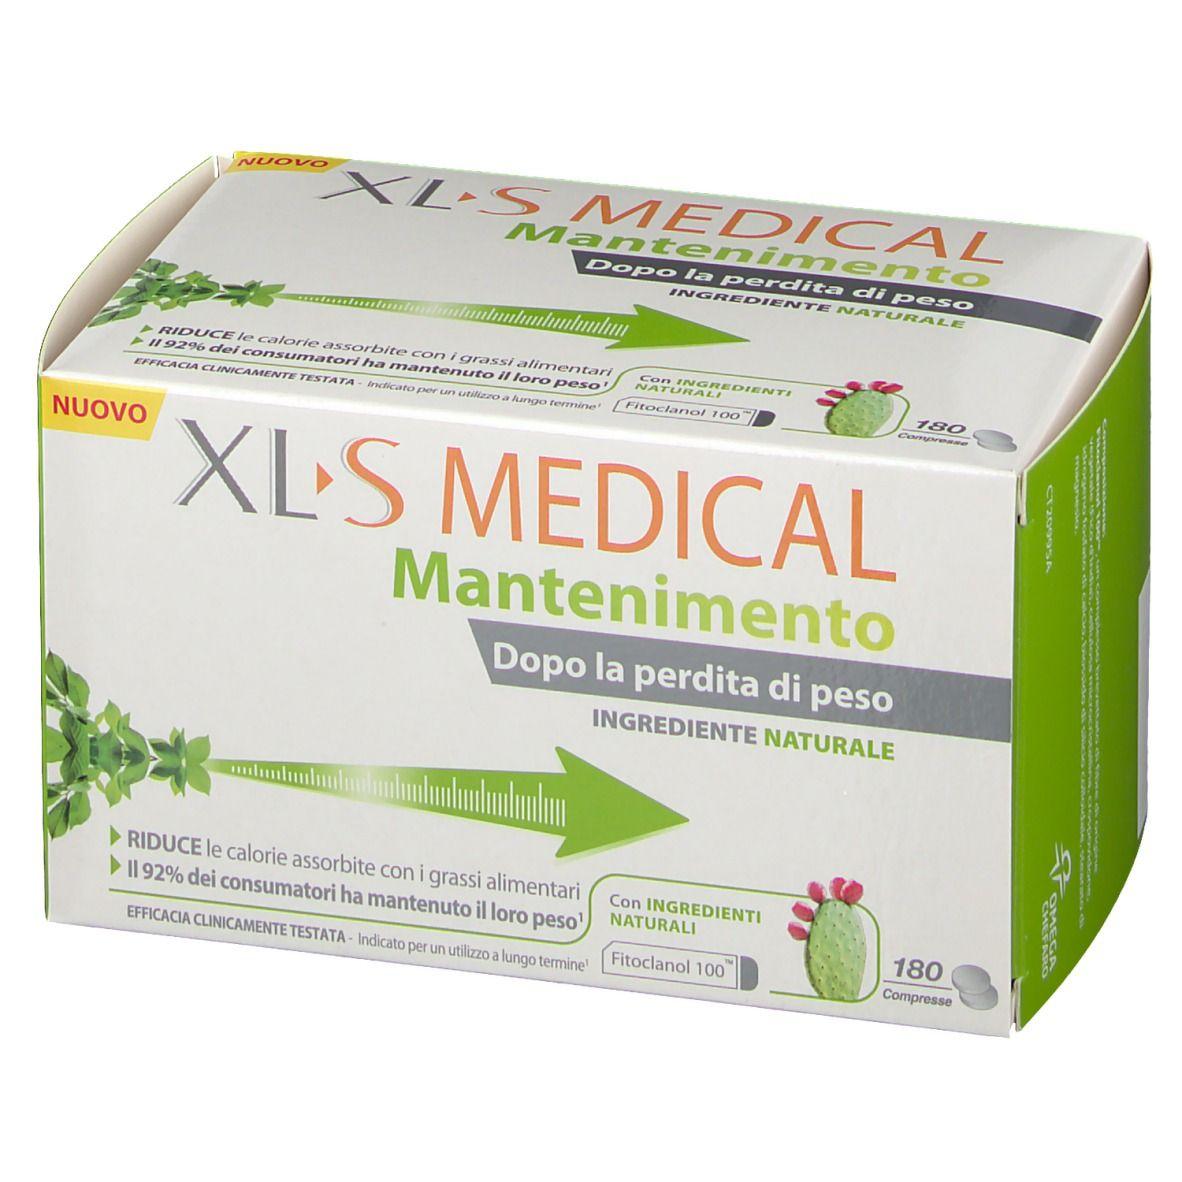 XL-S Medical Mantenimento